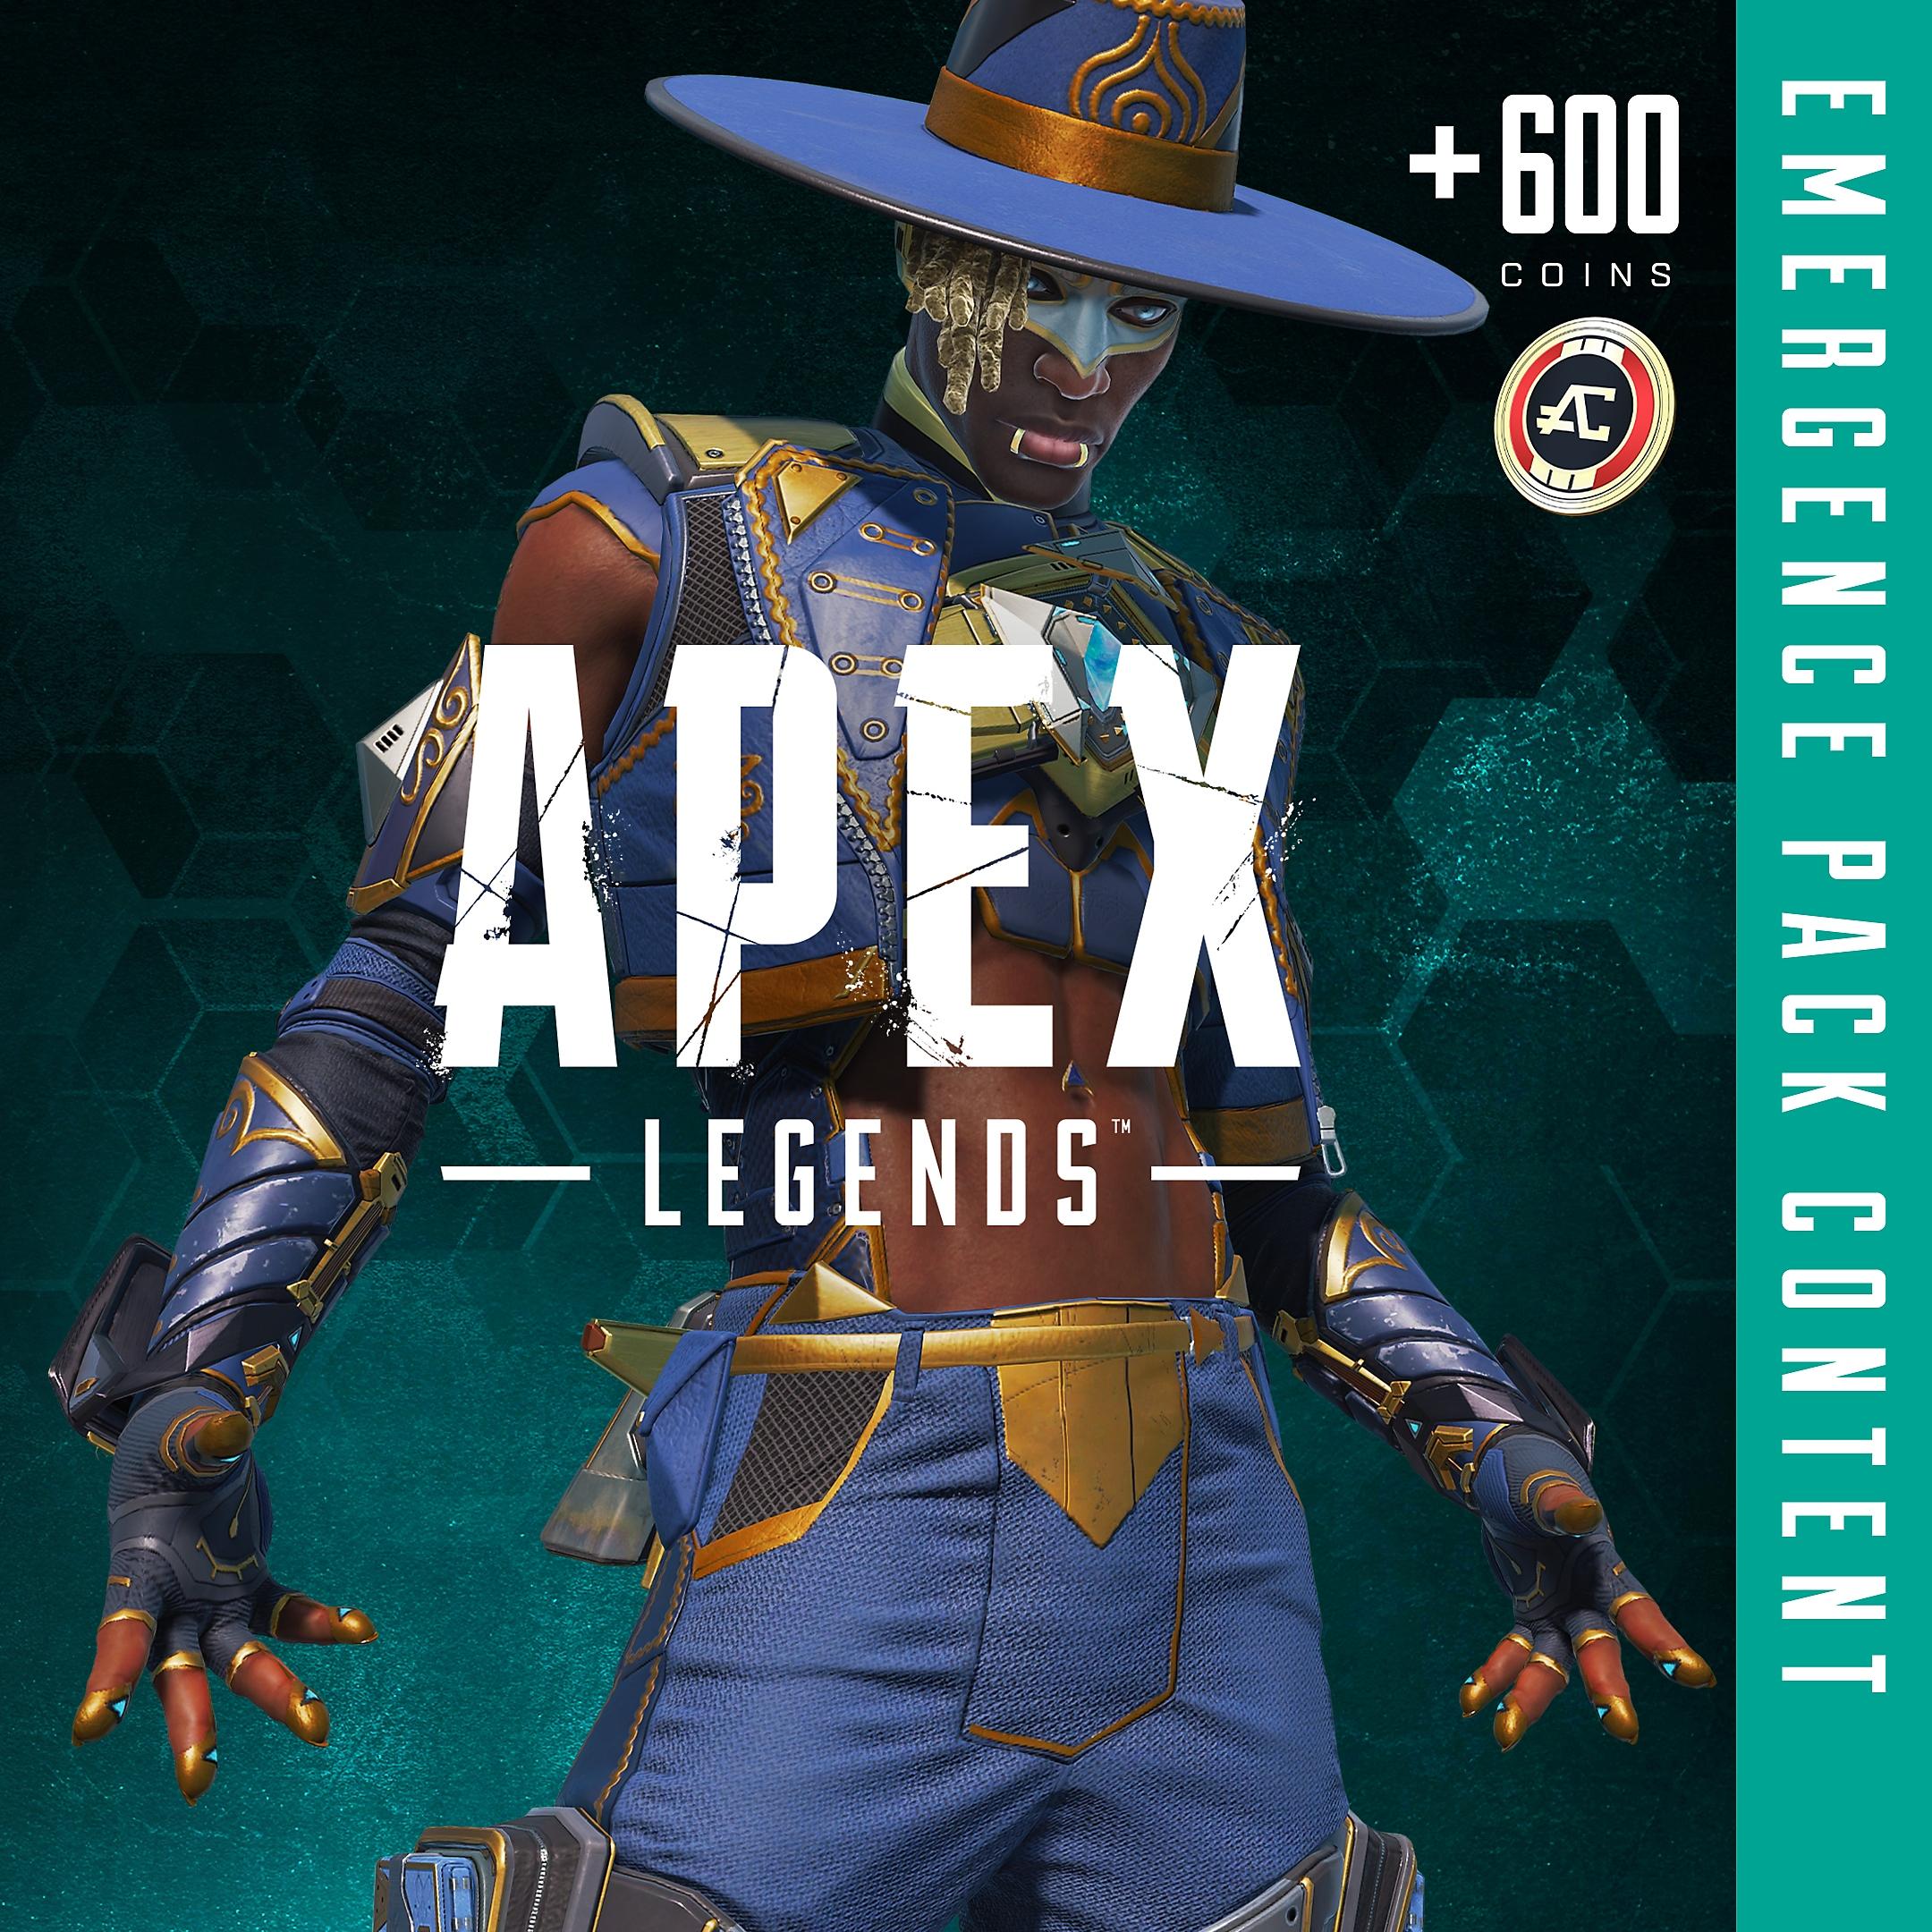 Apex legends emergence pack image